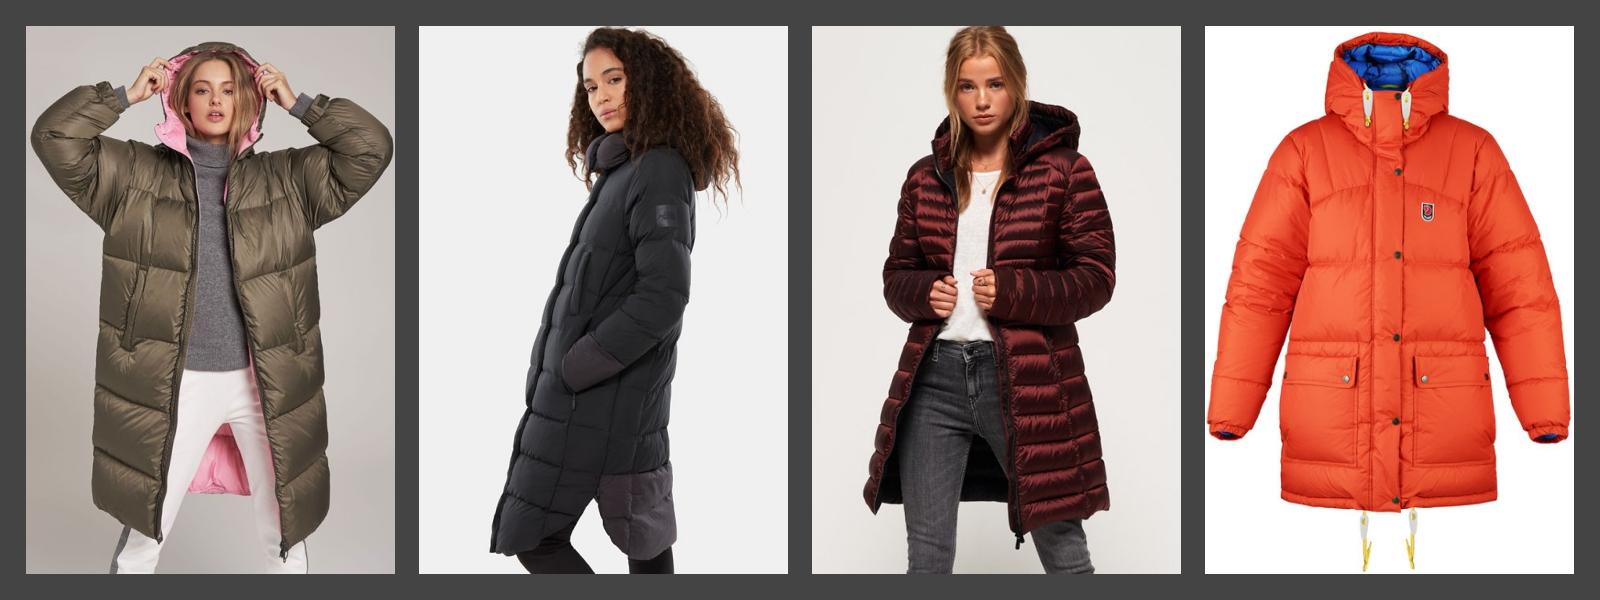 eac5a3e1d512 mode-skieuse-montagne-hiver-fashion-style-look-ville-